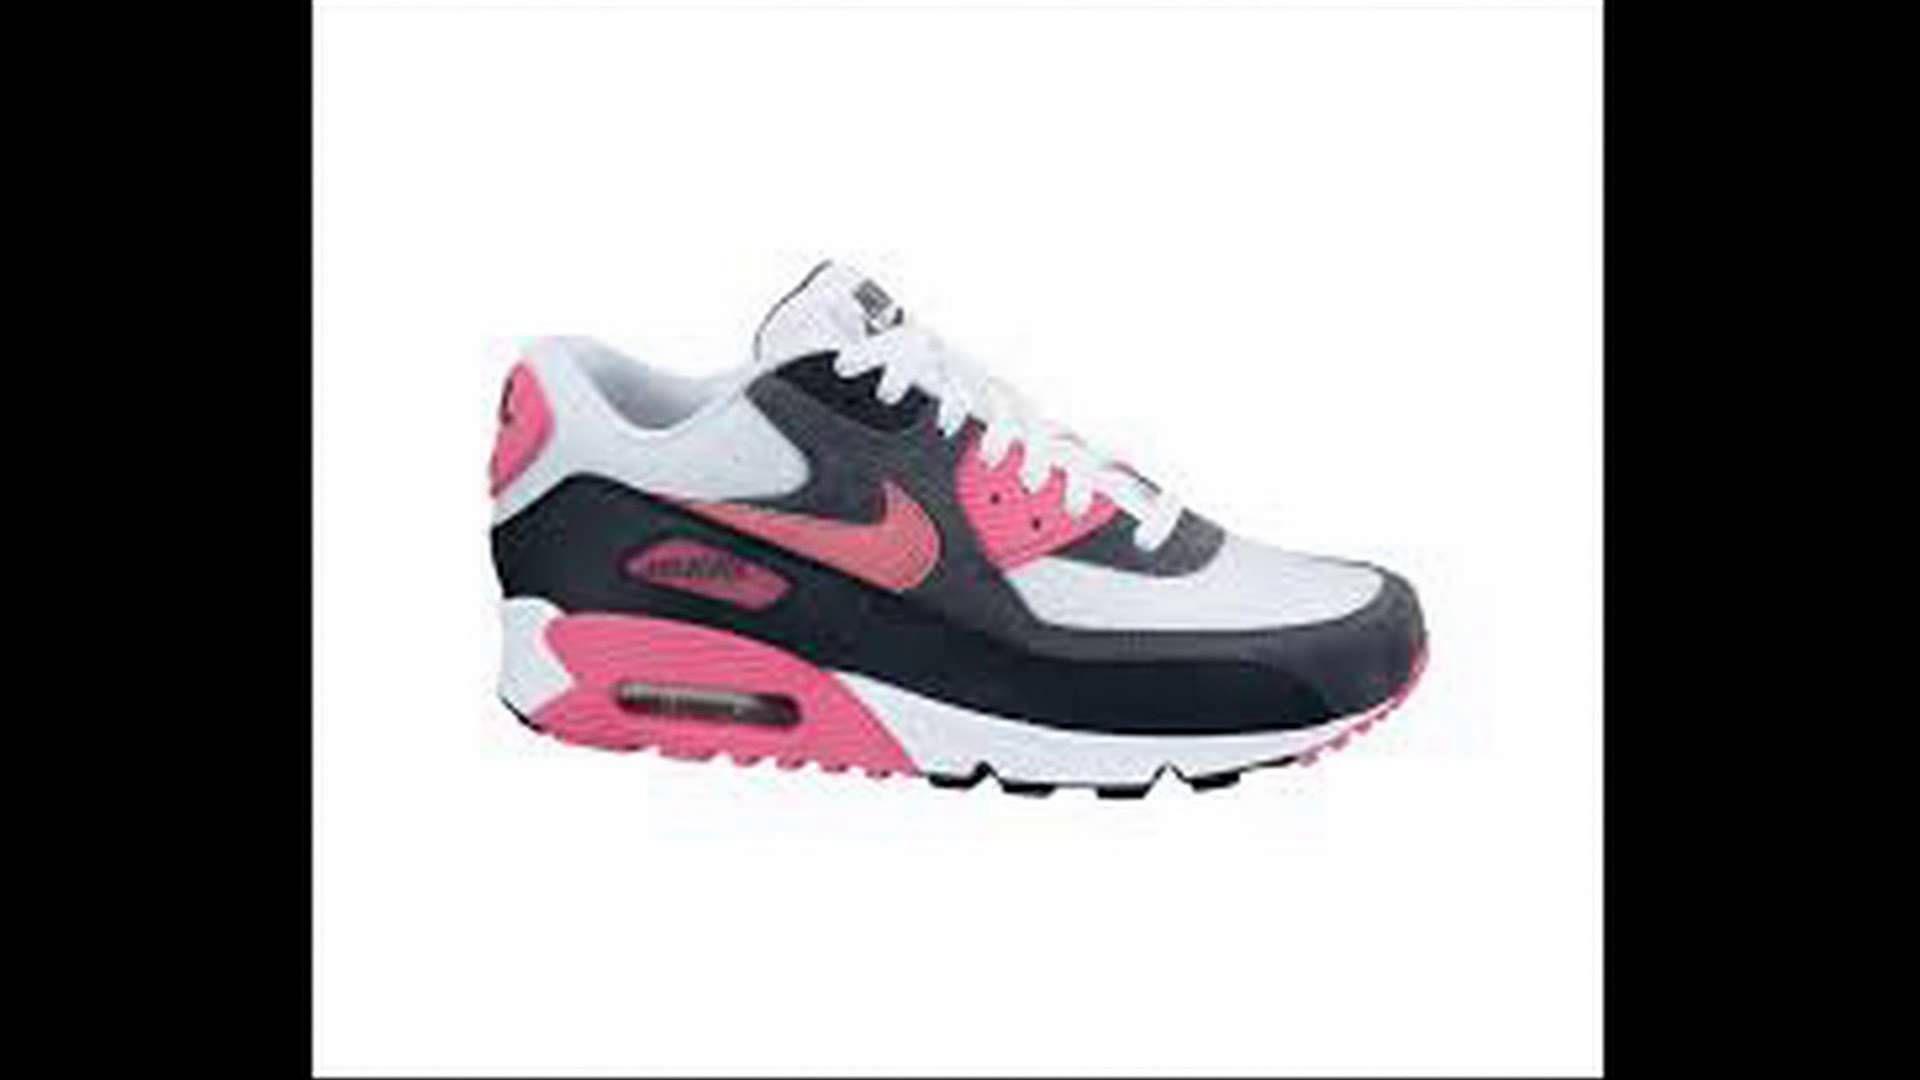 nike air max 2015 br 40-45 unisex spor ayakkabı